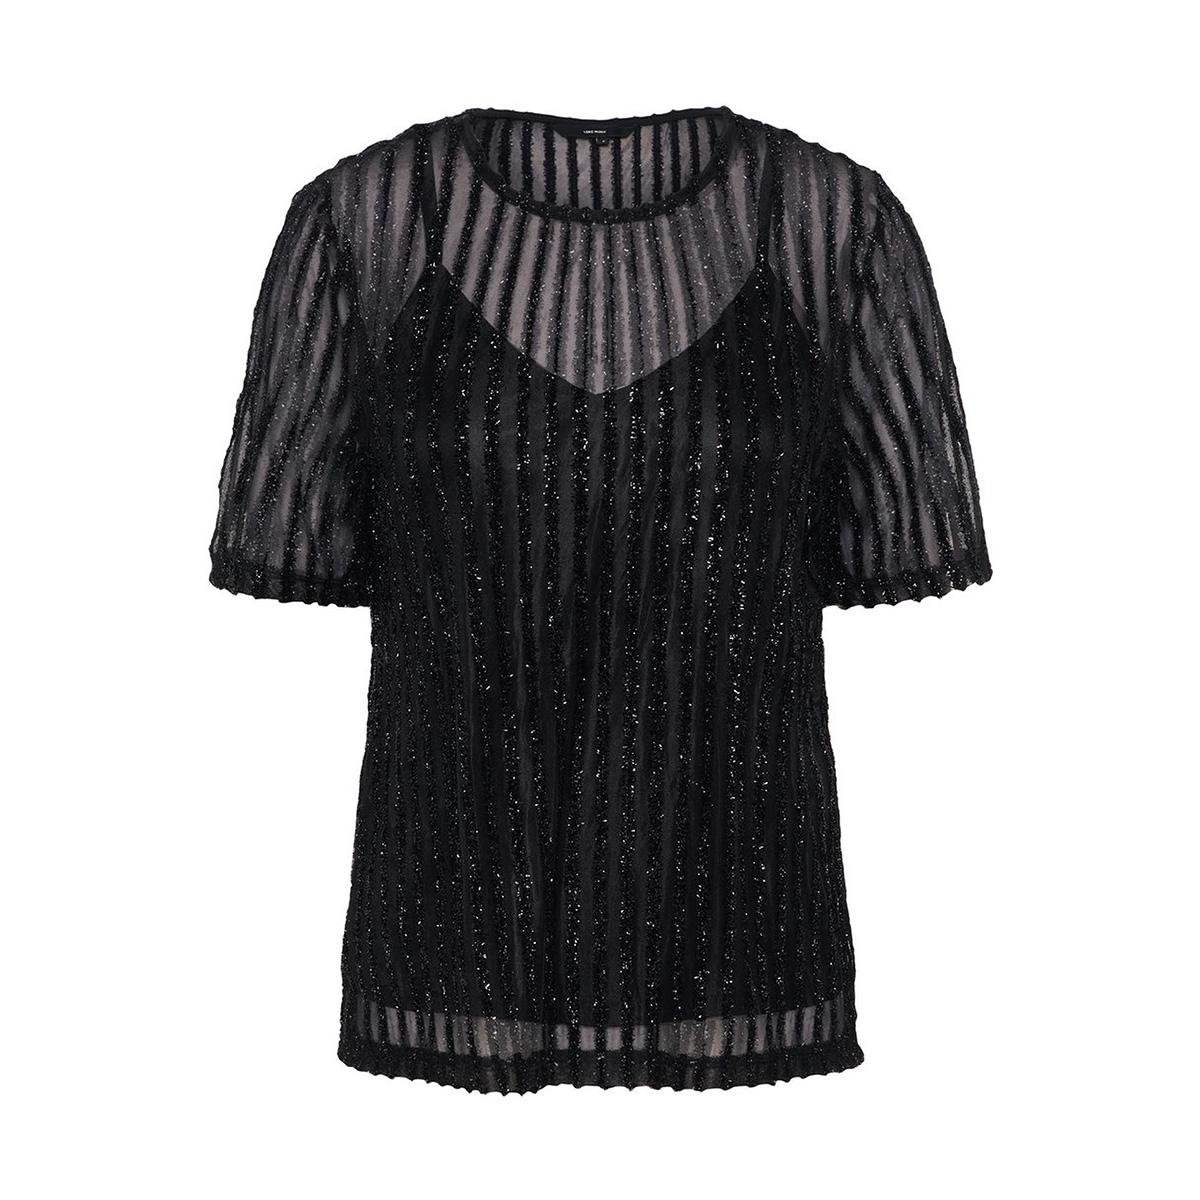 vmshane ss top 10206705 vero moda t-shirt black